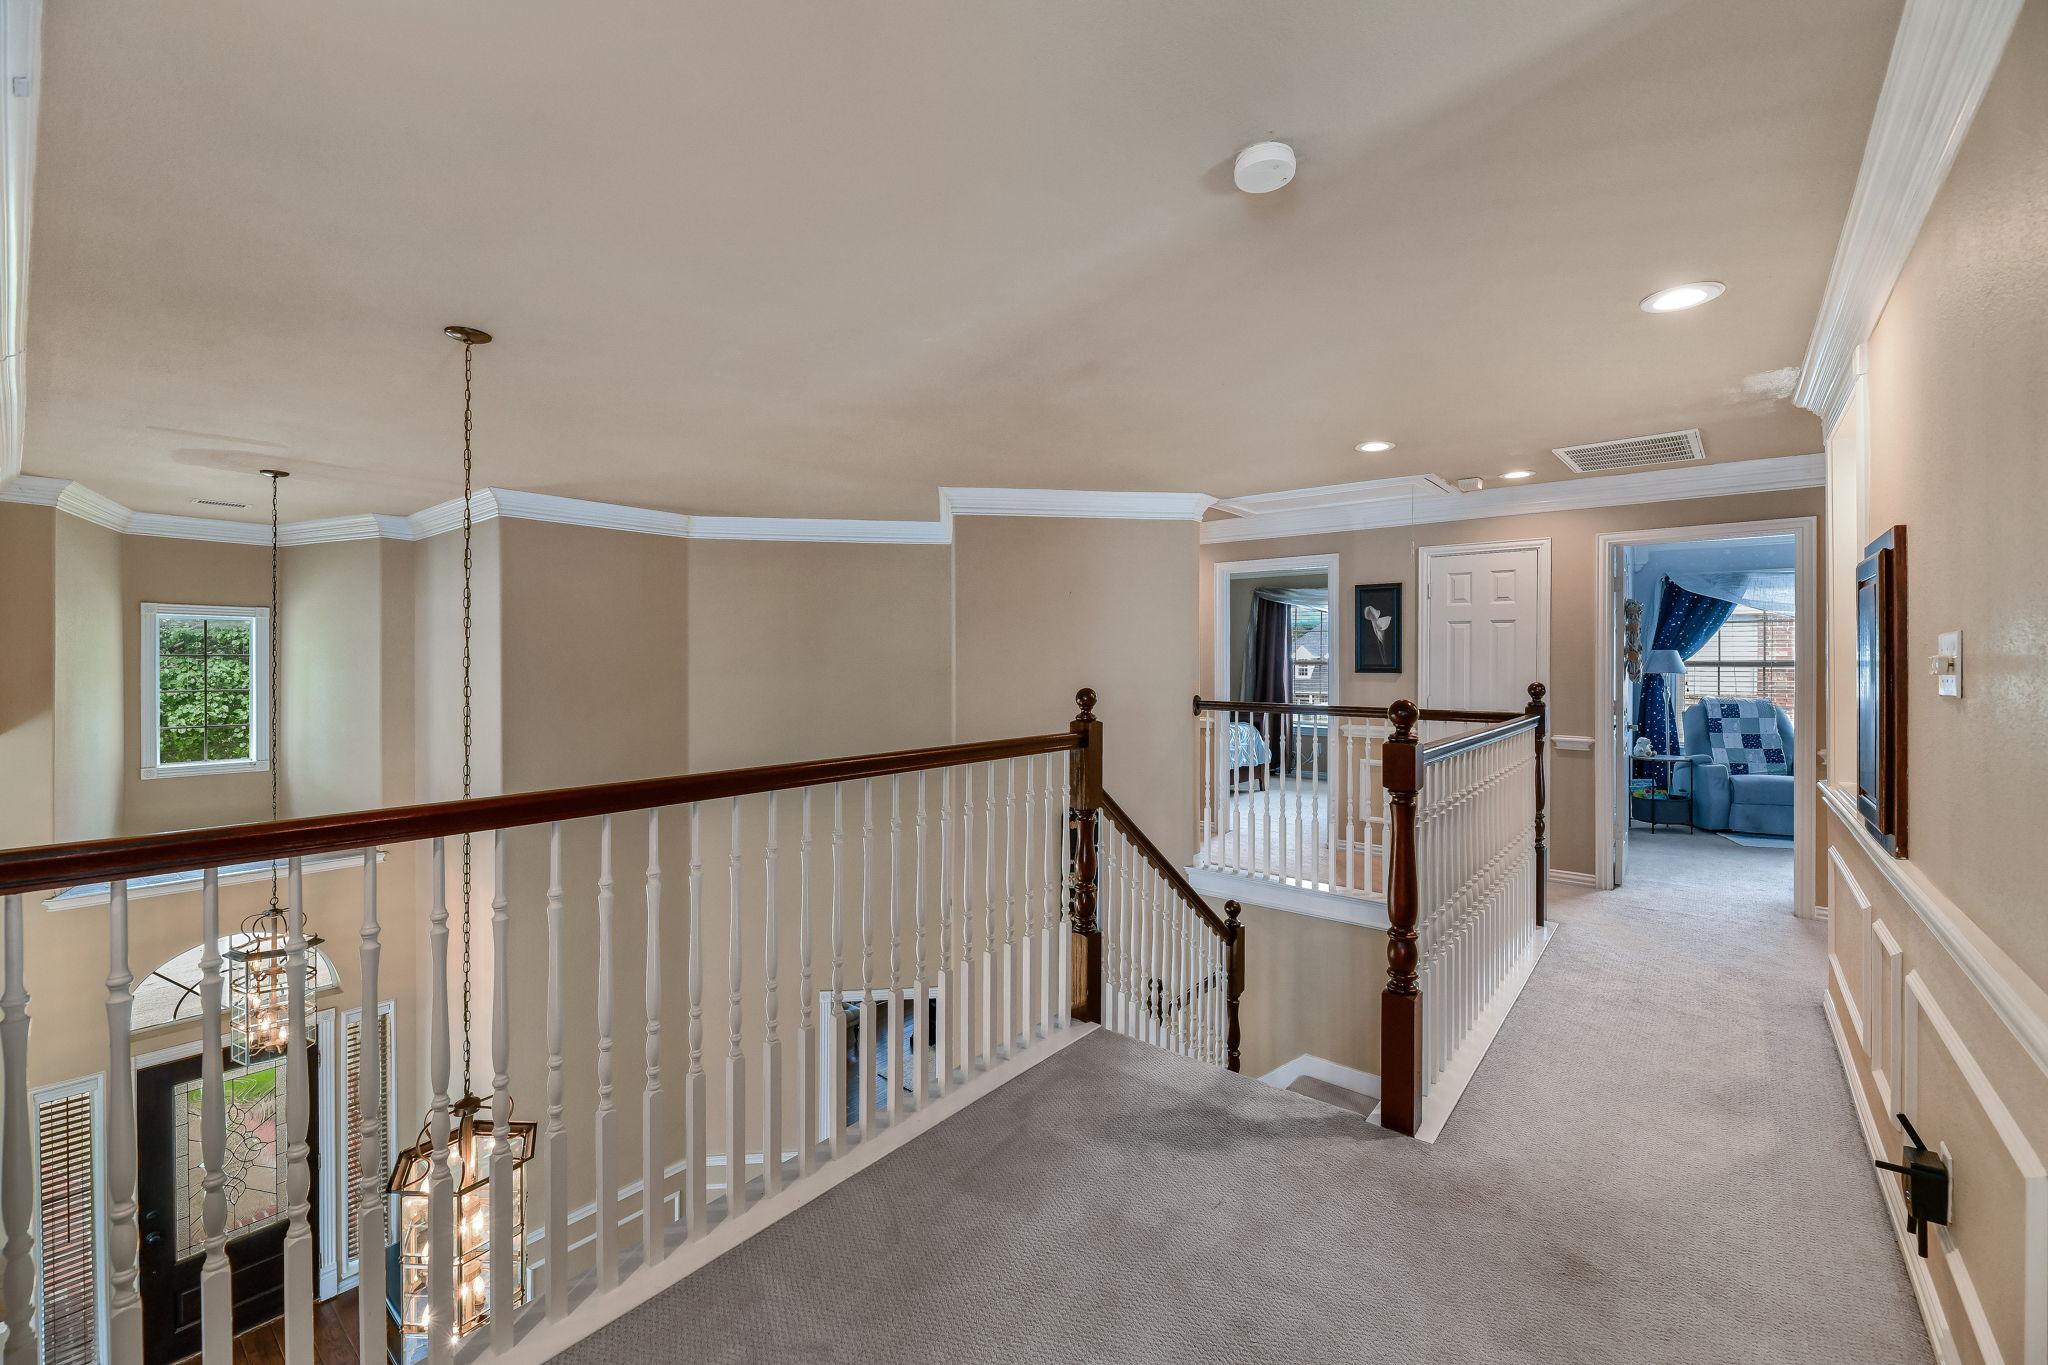 032-Upstairs Loft-FULL